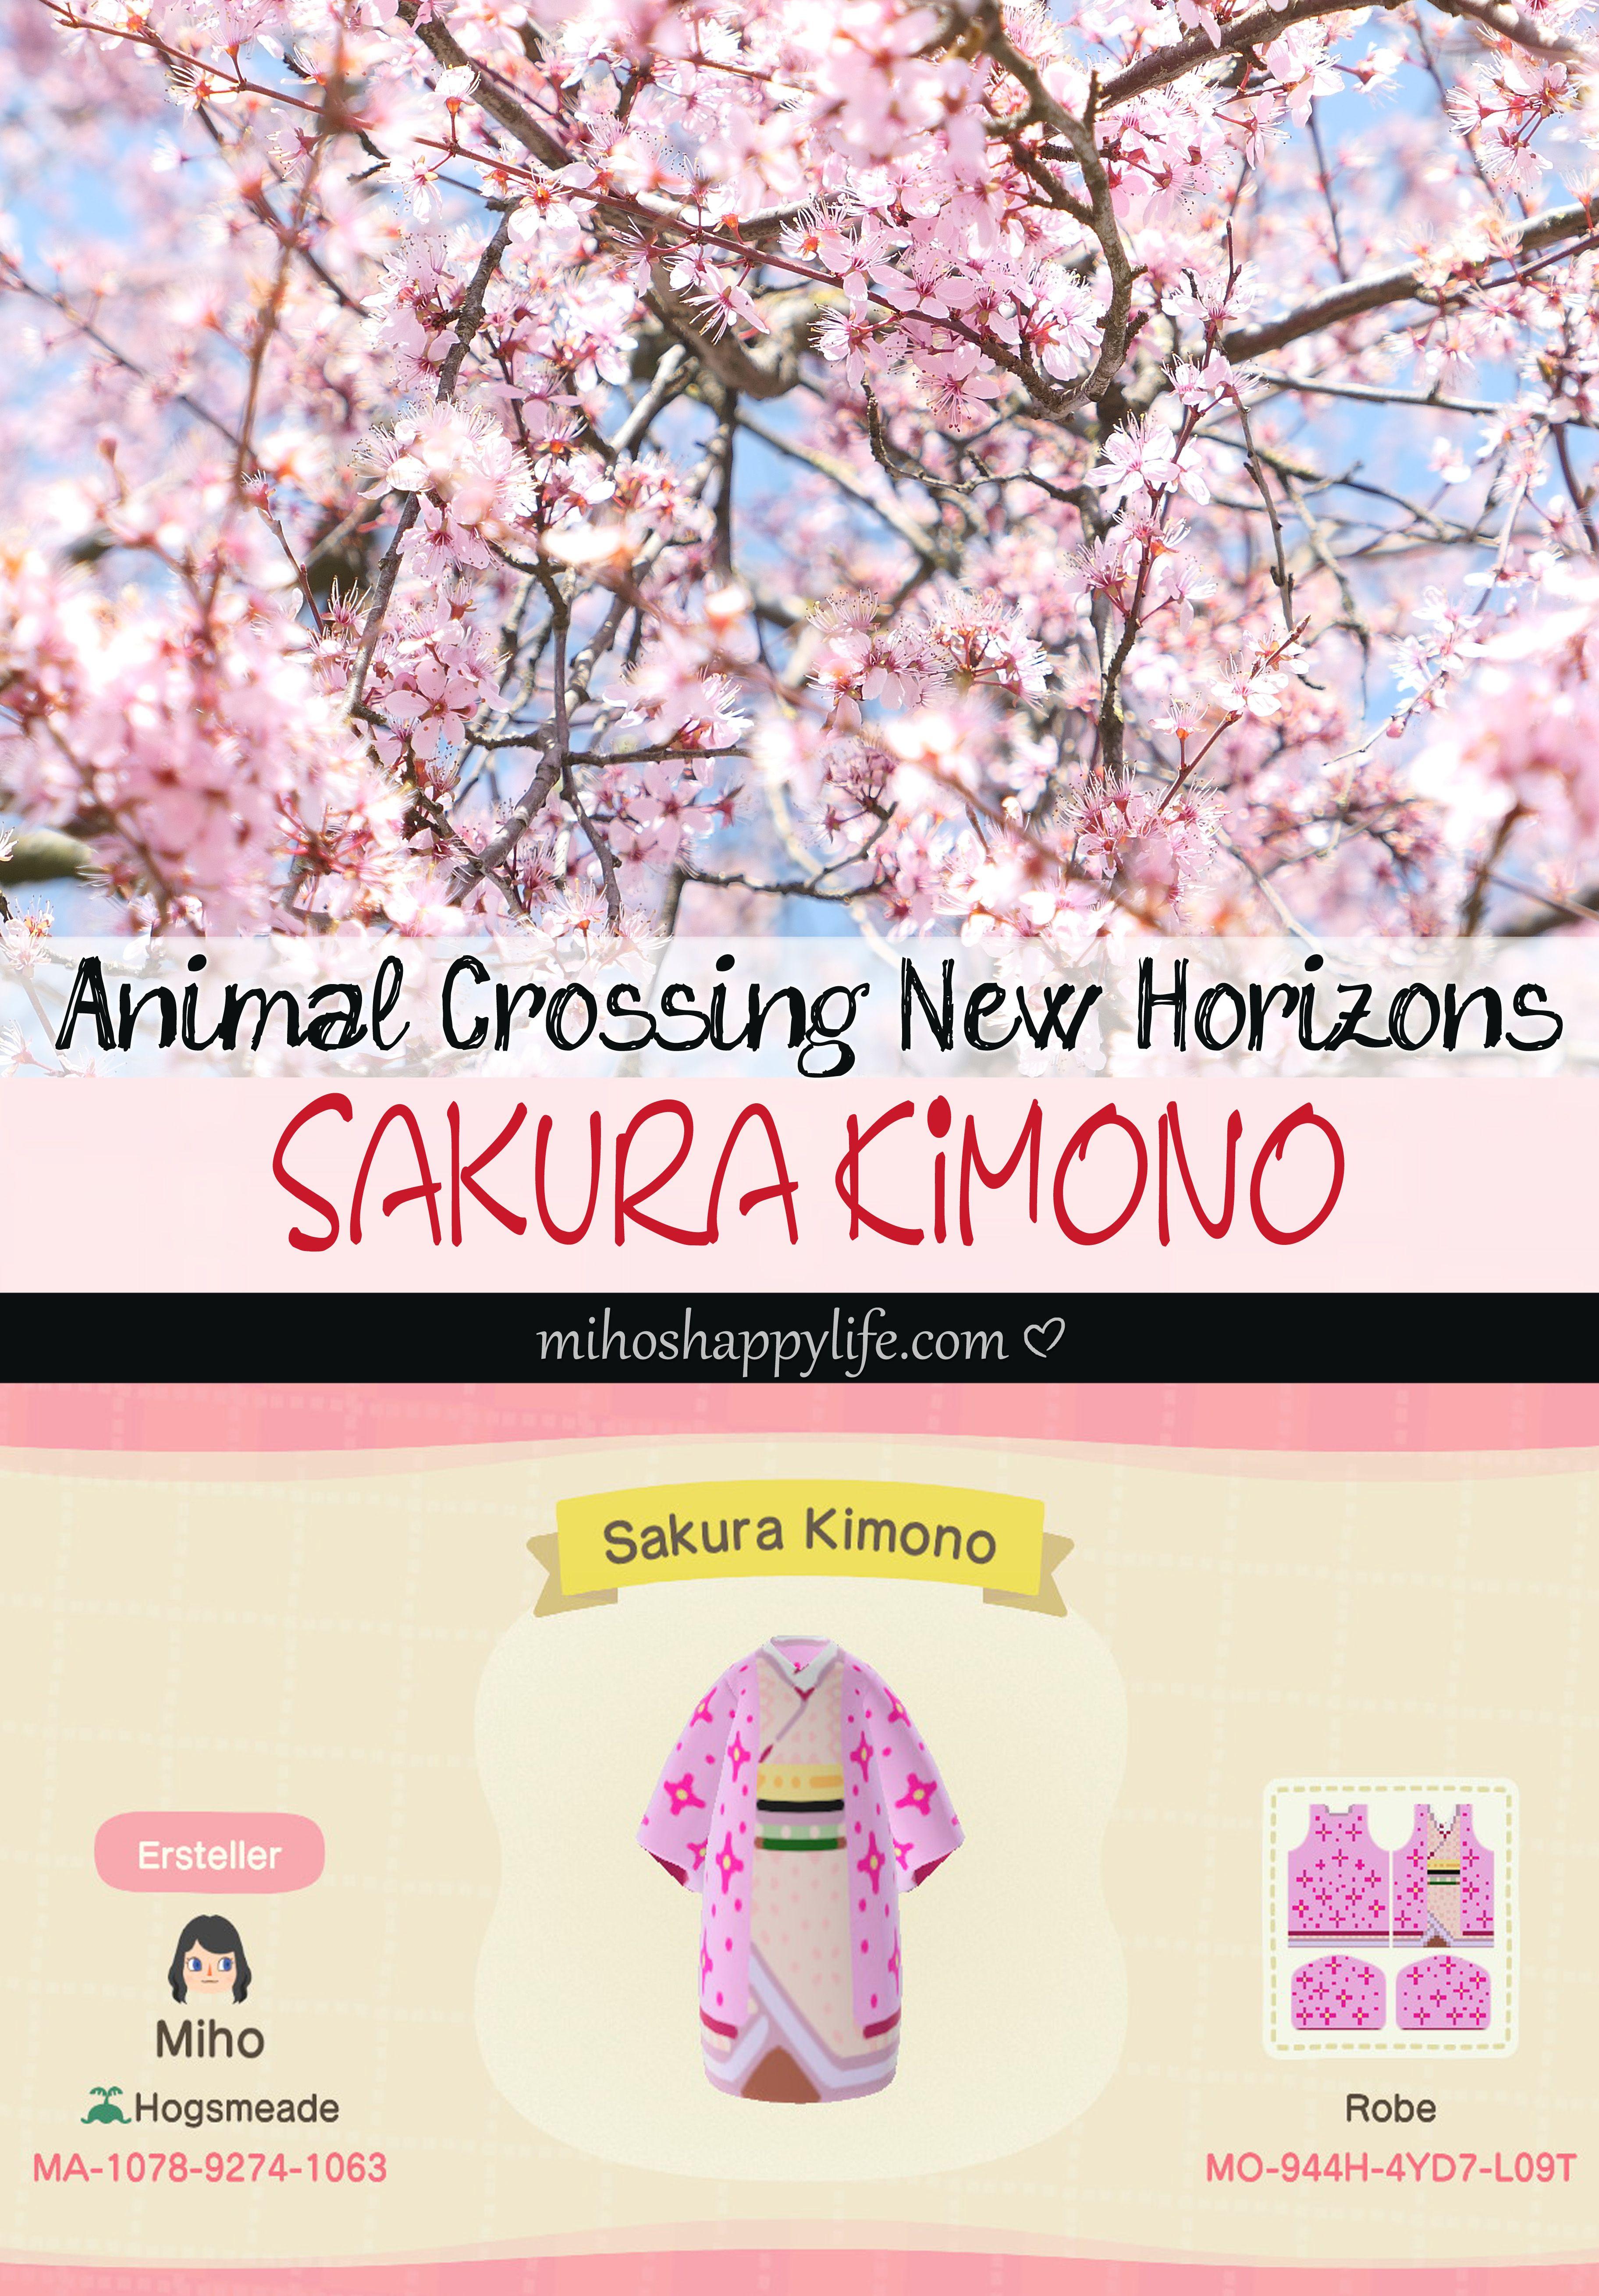 Animal Crossing New Horizons Template Design Sakura Kimono Animal Crossing Template Design Design